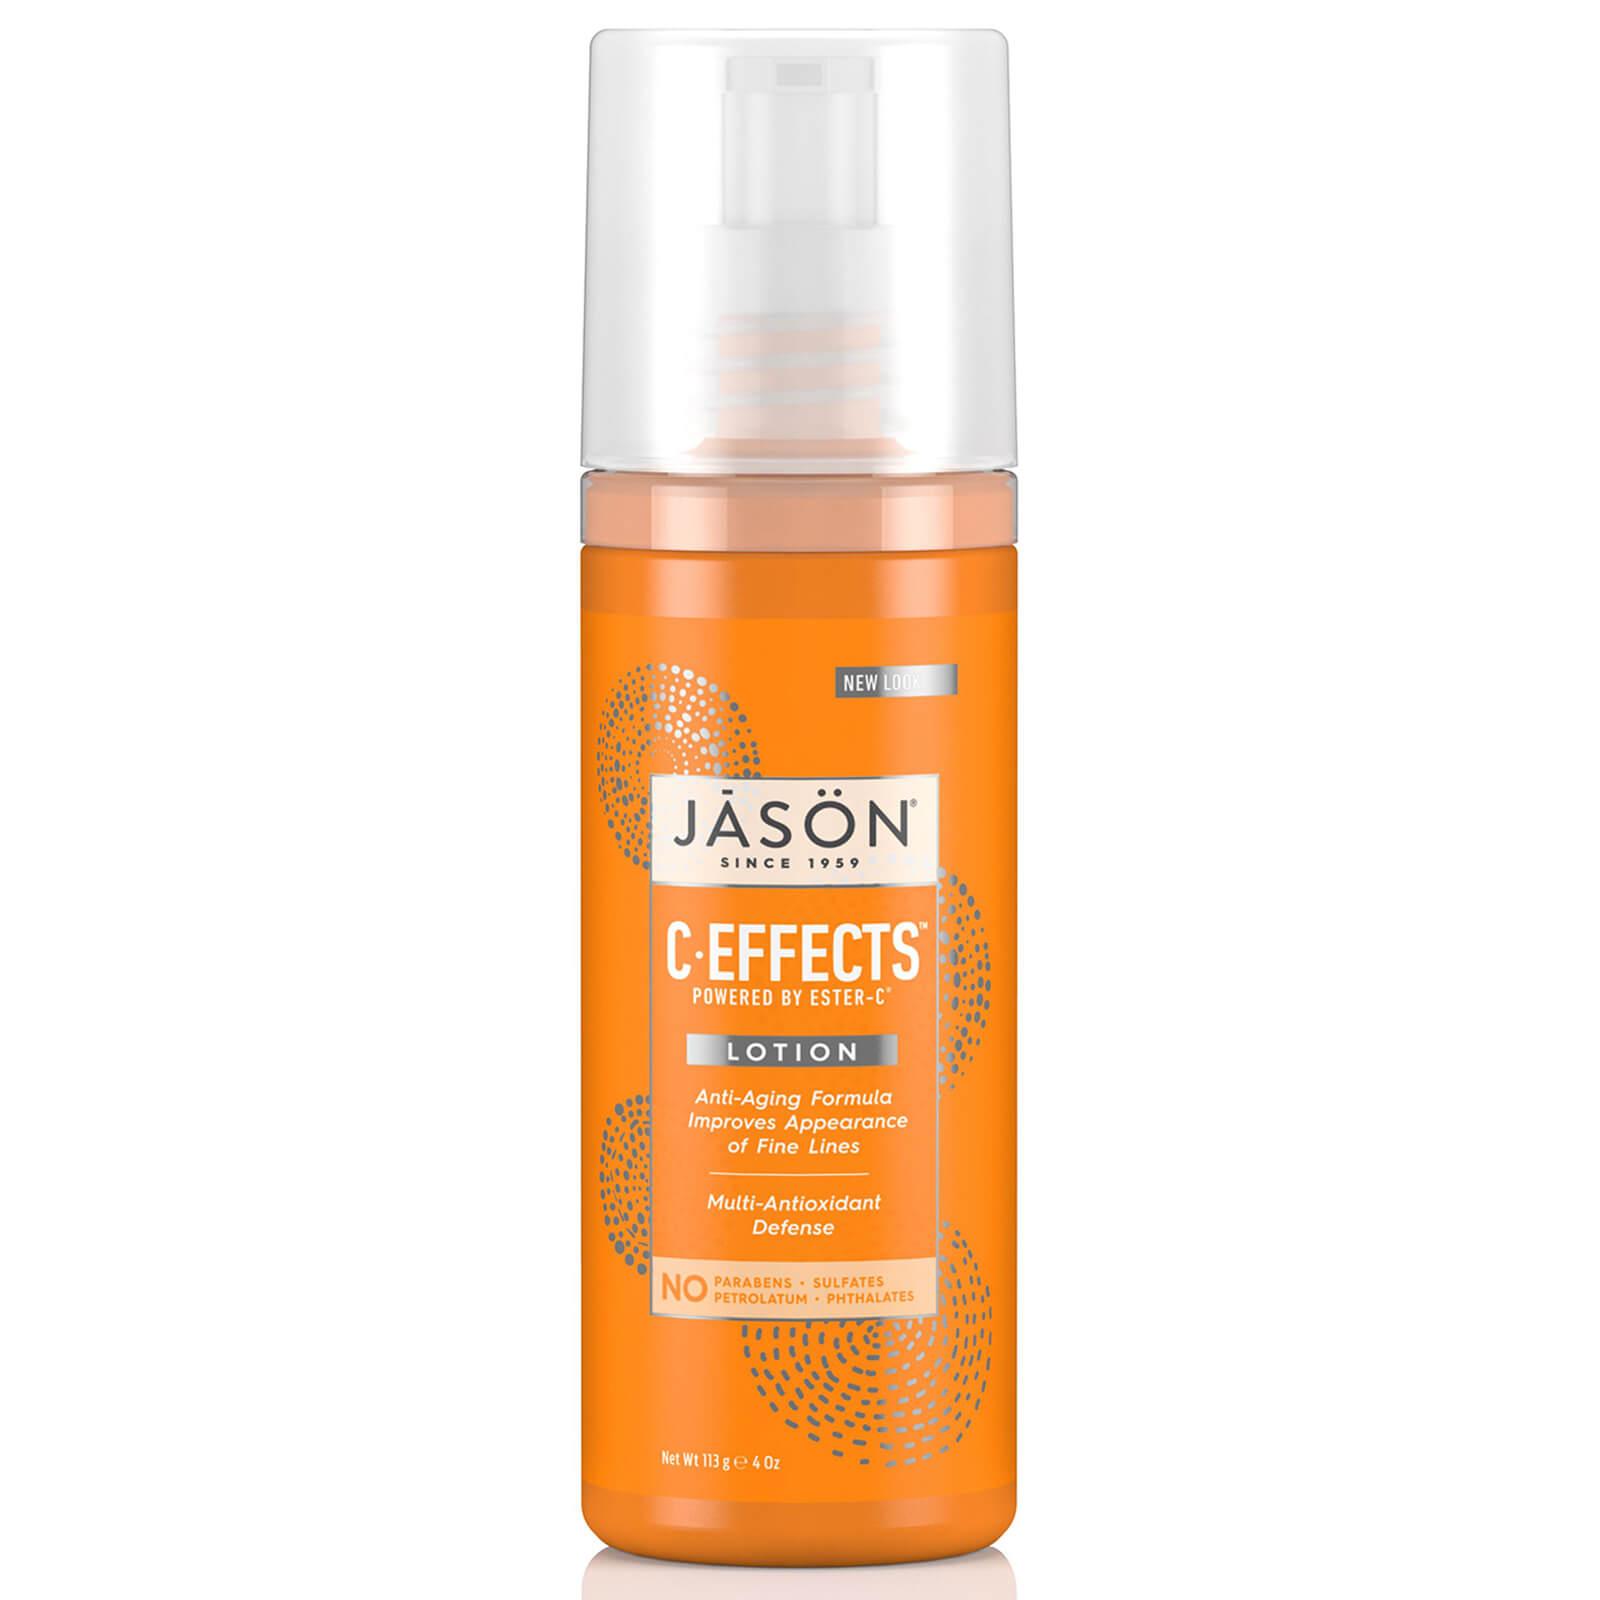 JASON C-Effects Lotion (120ml)